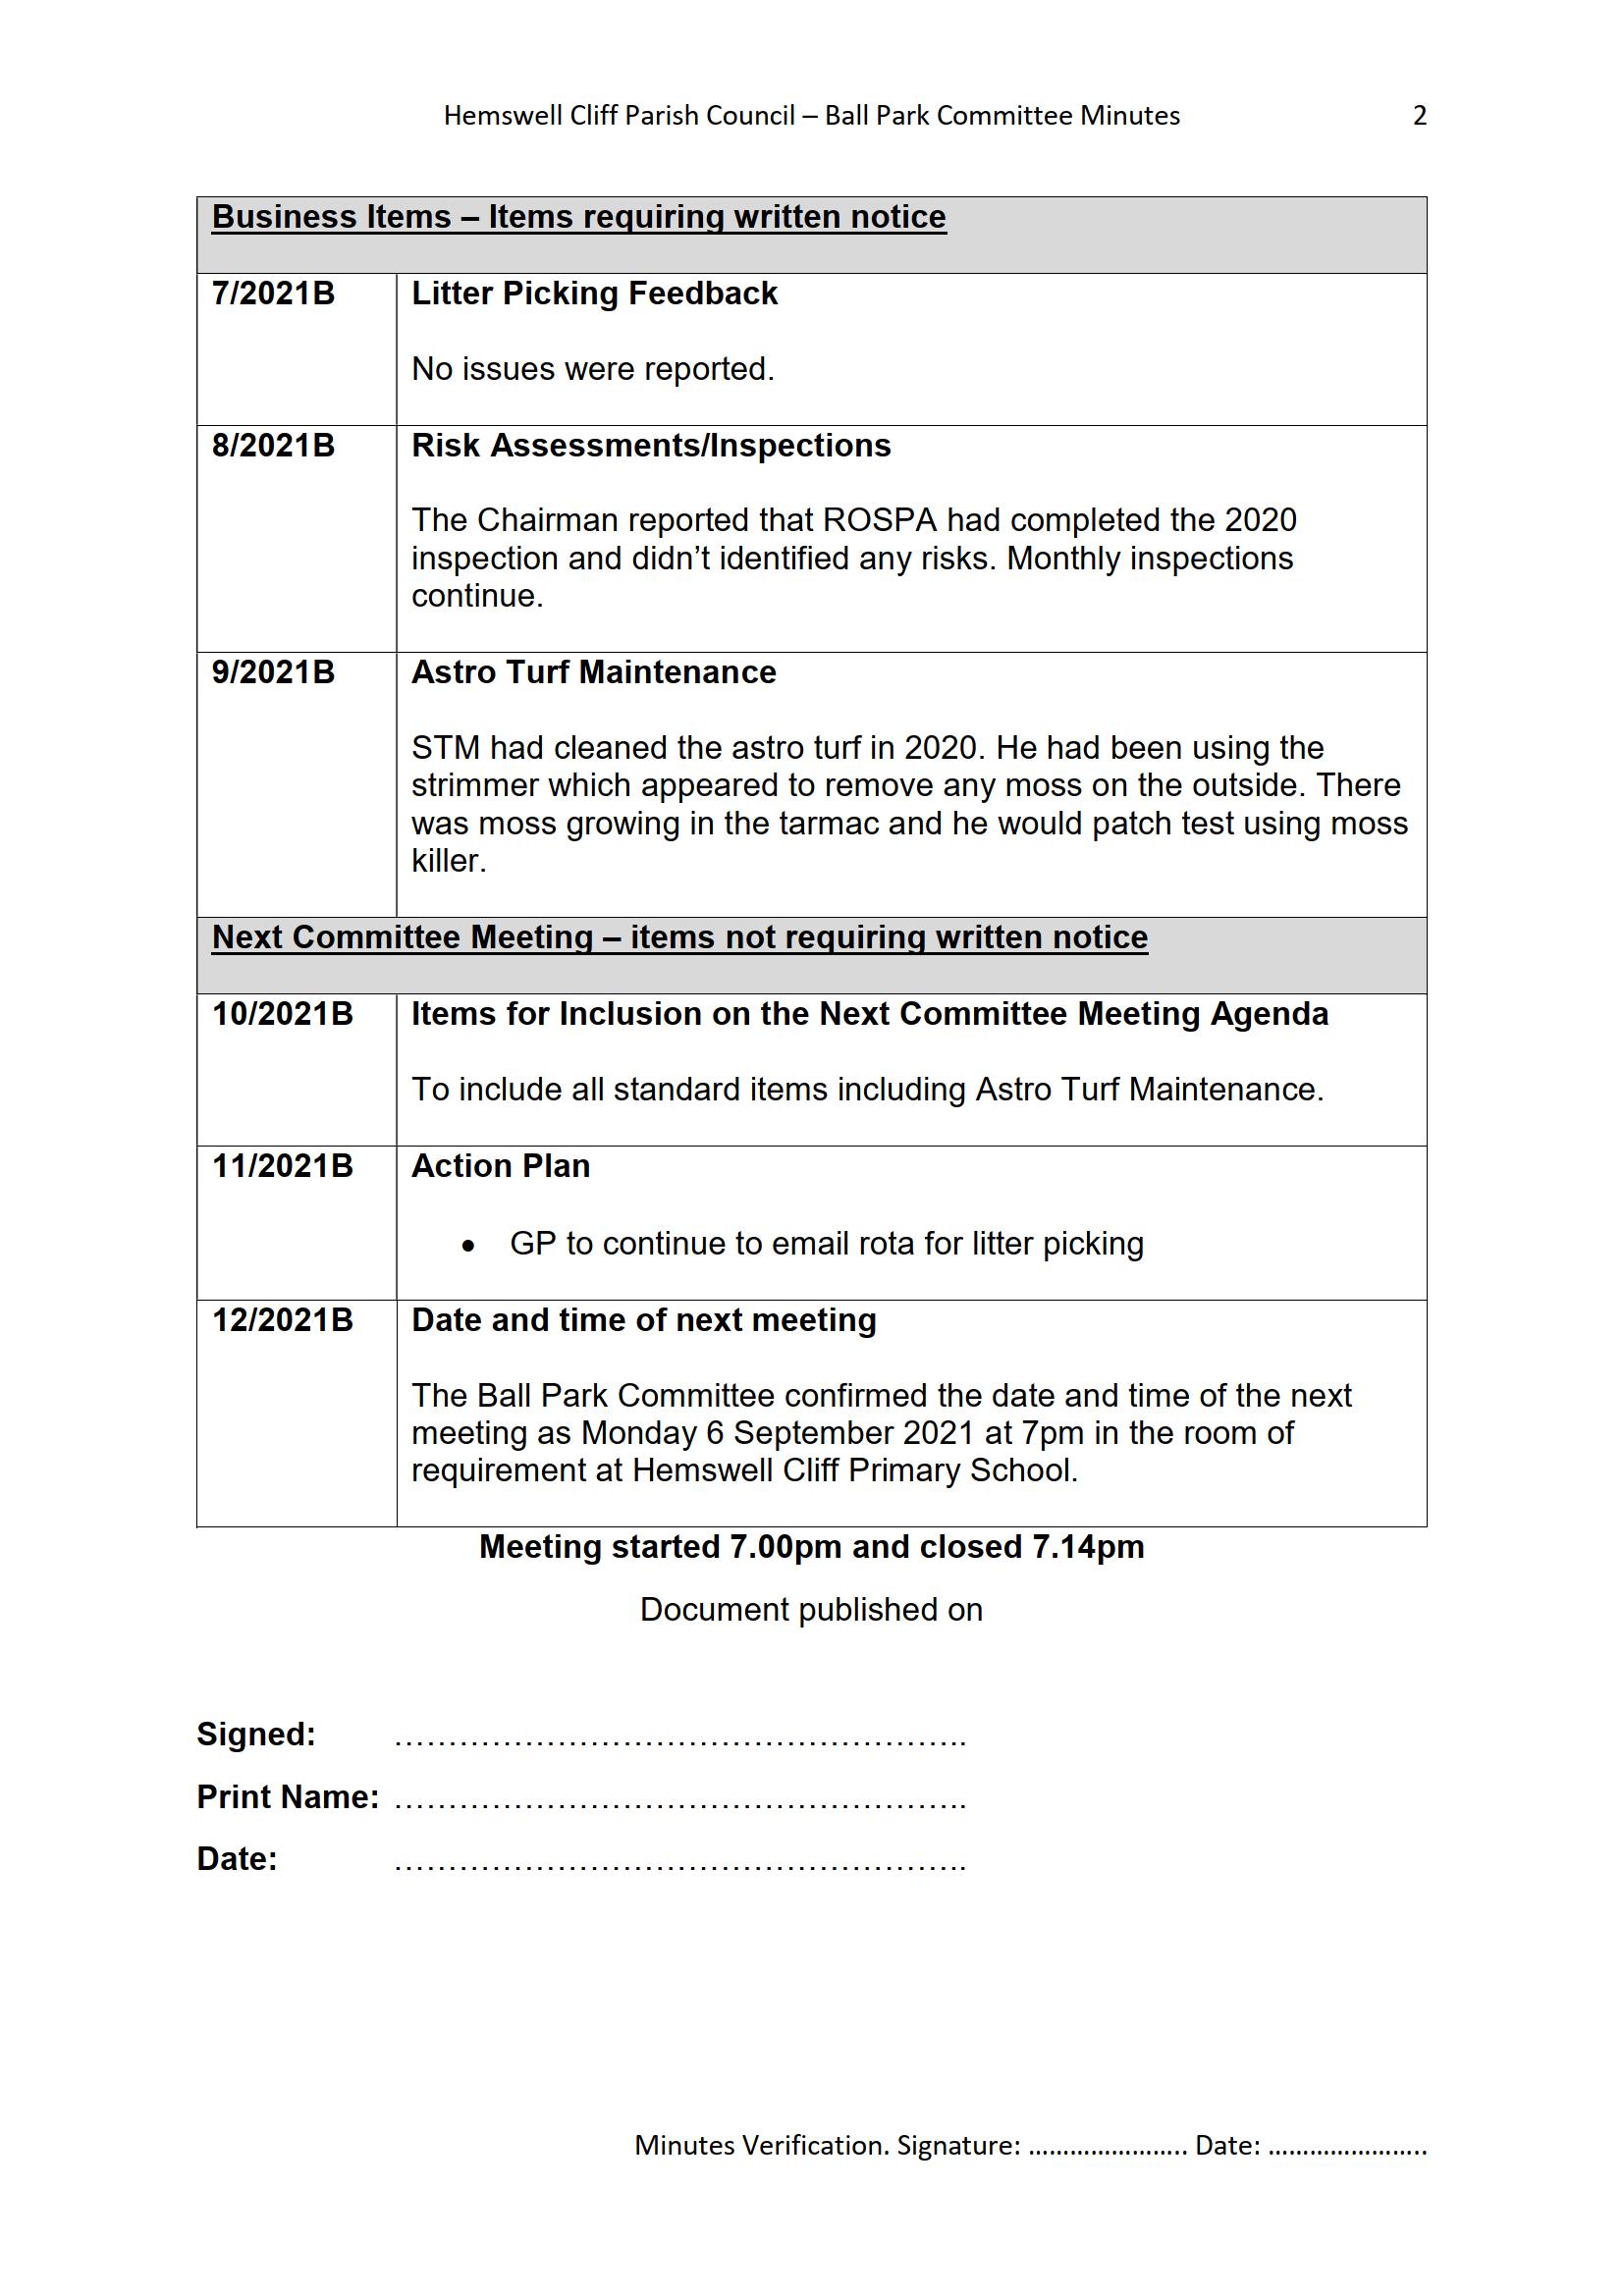 HCPC_BallPark_Minutes_27.04.21_2.png